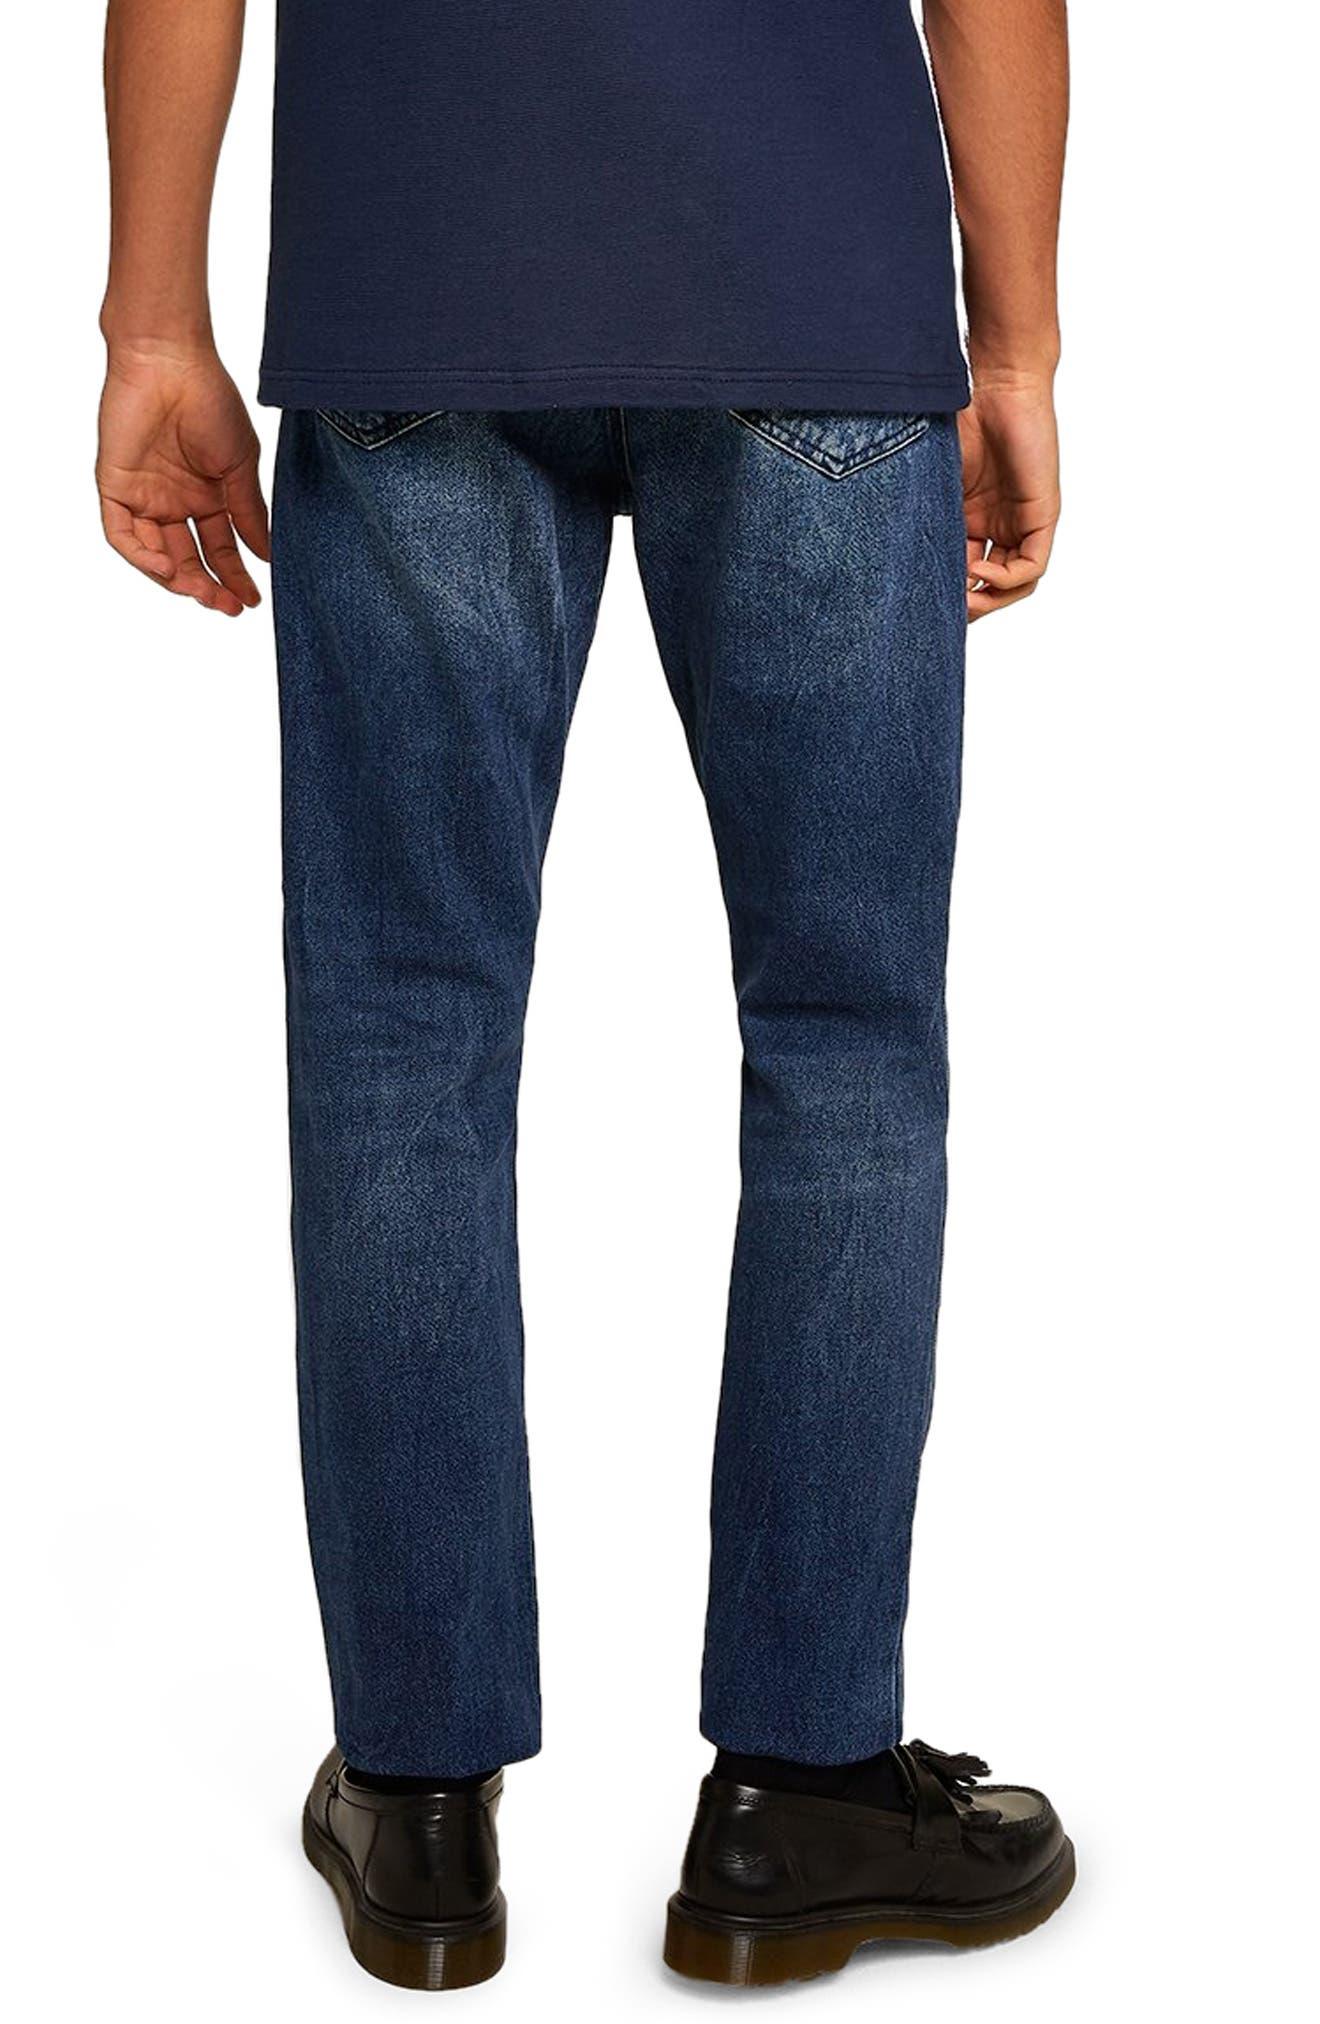 Cupid Rigid Taper Jeans,                             Alternate thumbnail 2, color,                             DARK BLUE